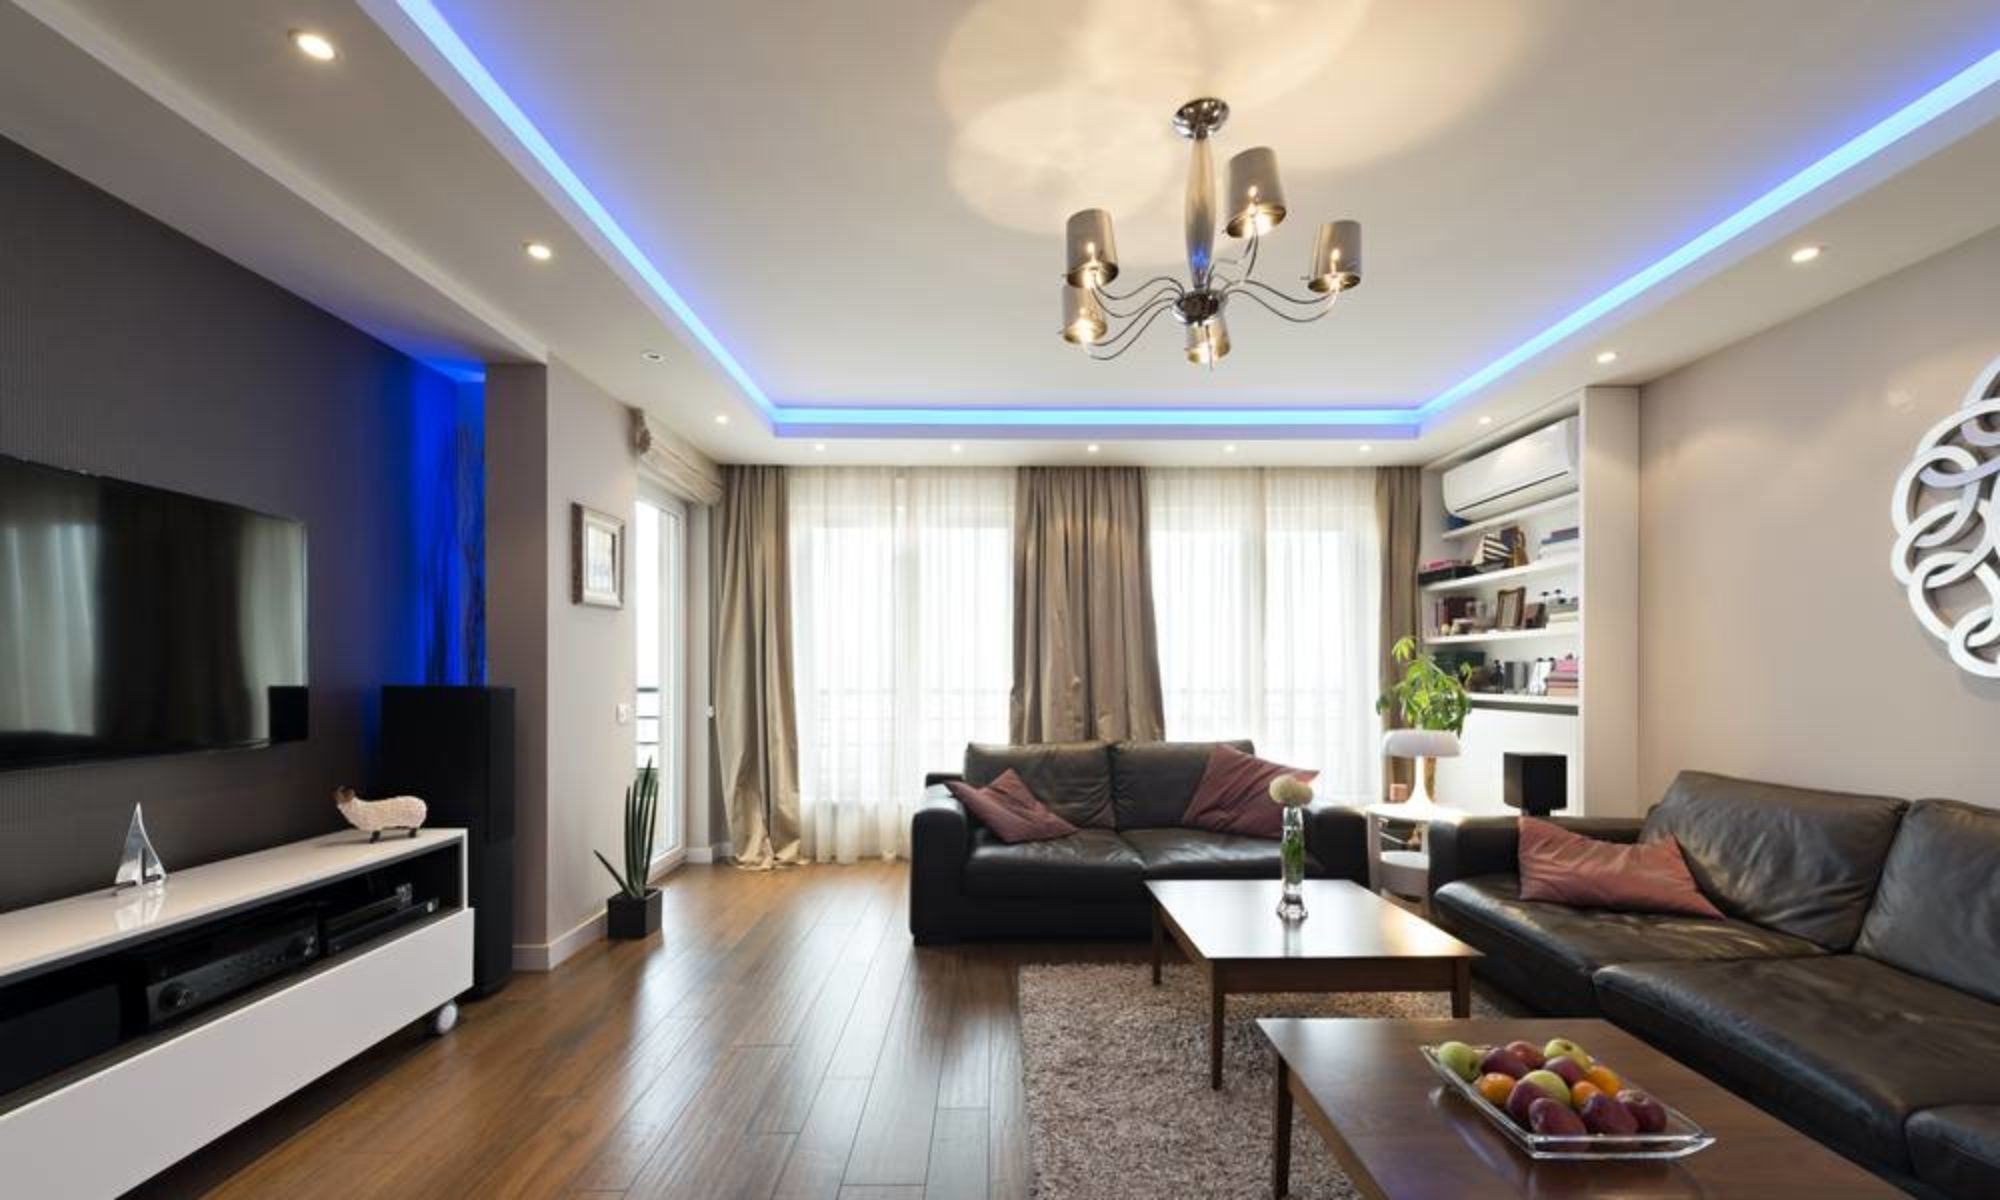 Beleuchtung Wohnzimmer Decke Spots